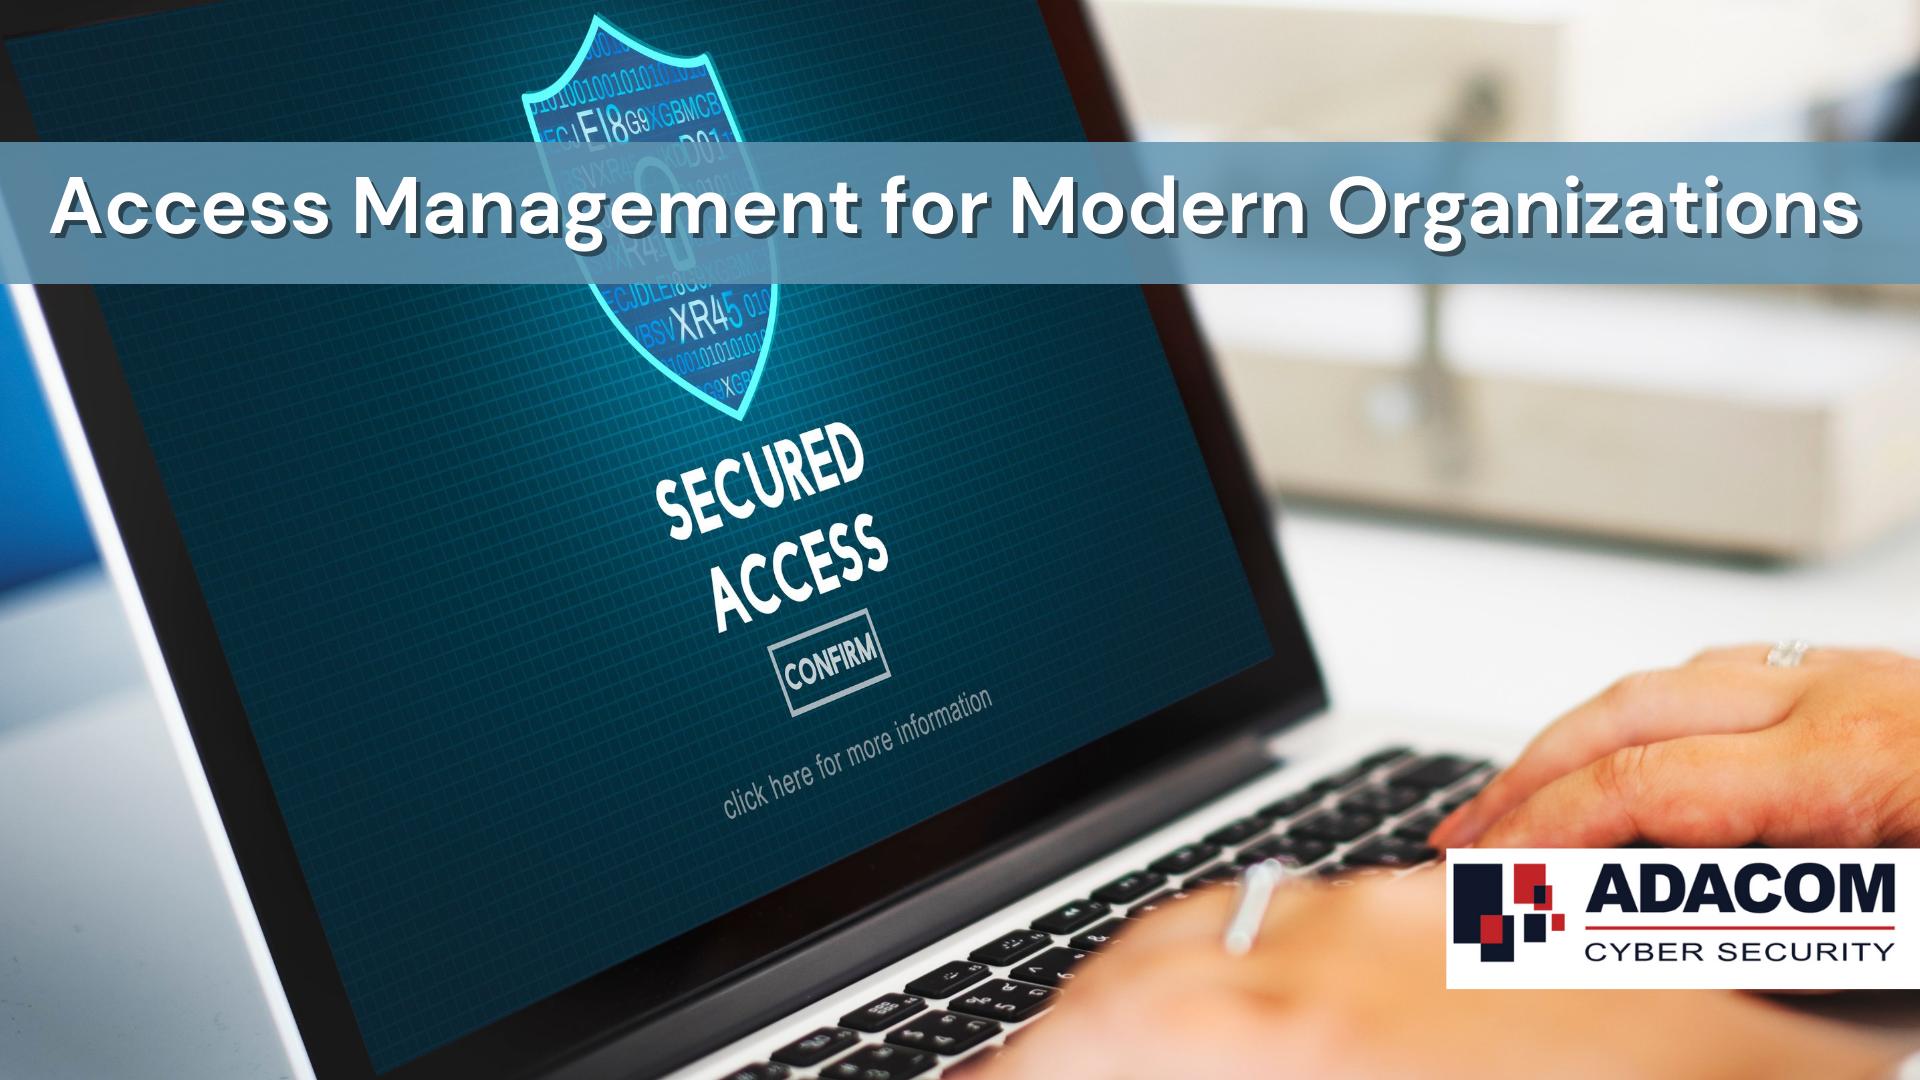 Access Management for Modern Organizations